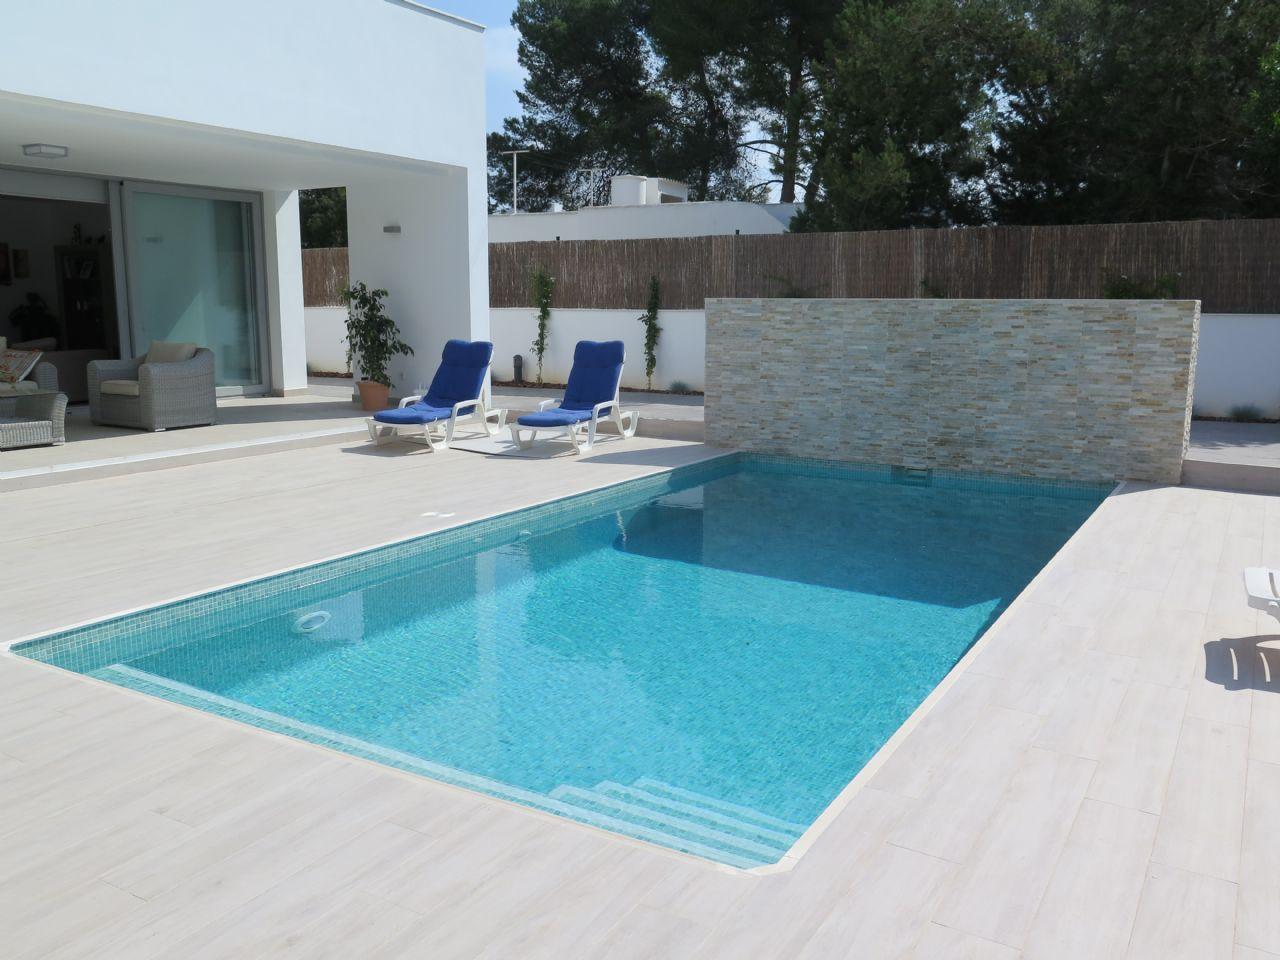 Rental House  Sant antoni. Chalet independiente con piscina privada.